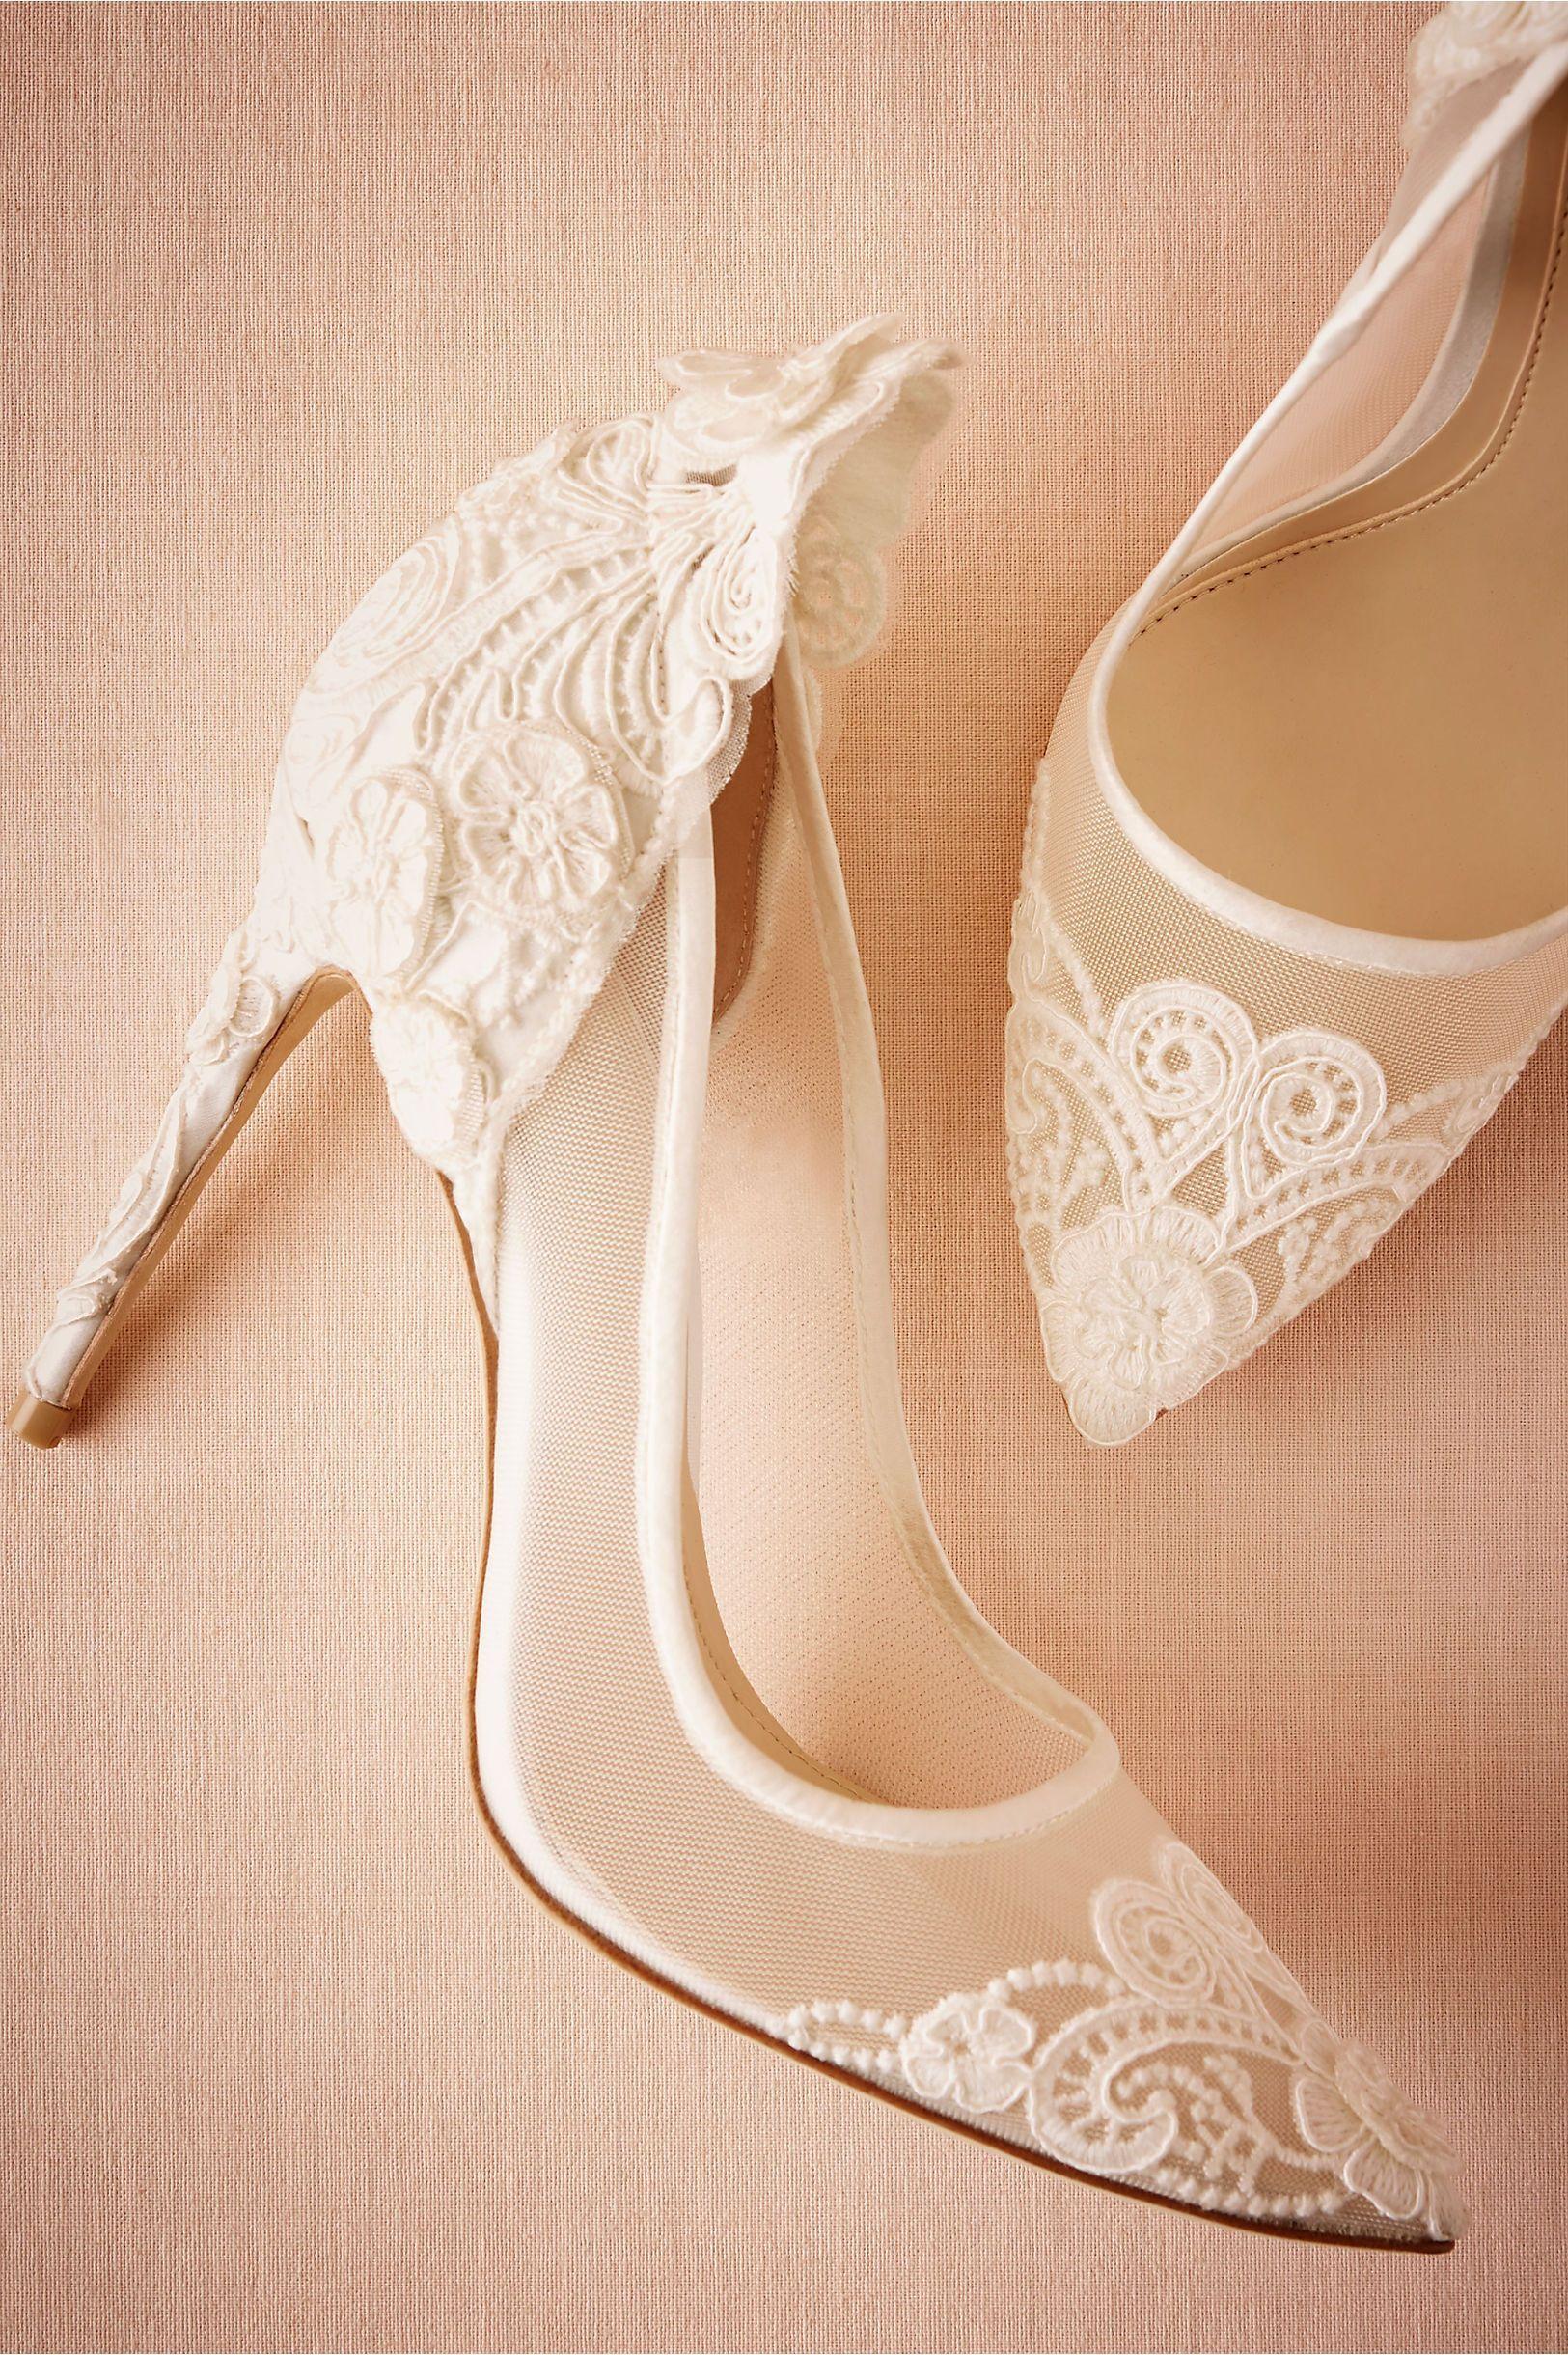 Pin By Karla Sofya On Dj Wedding In 2020 Bride Shoes Bridal Heels Wedding Shoes